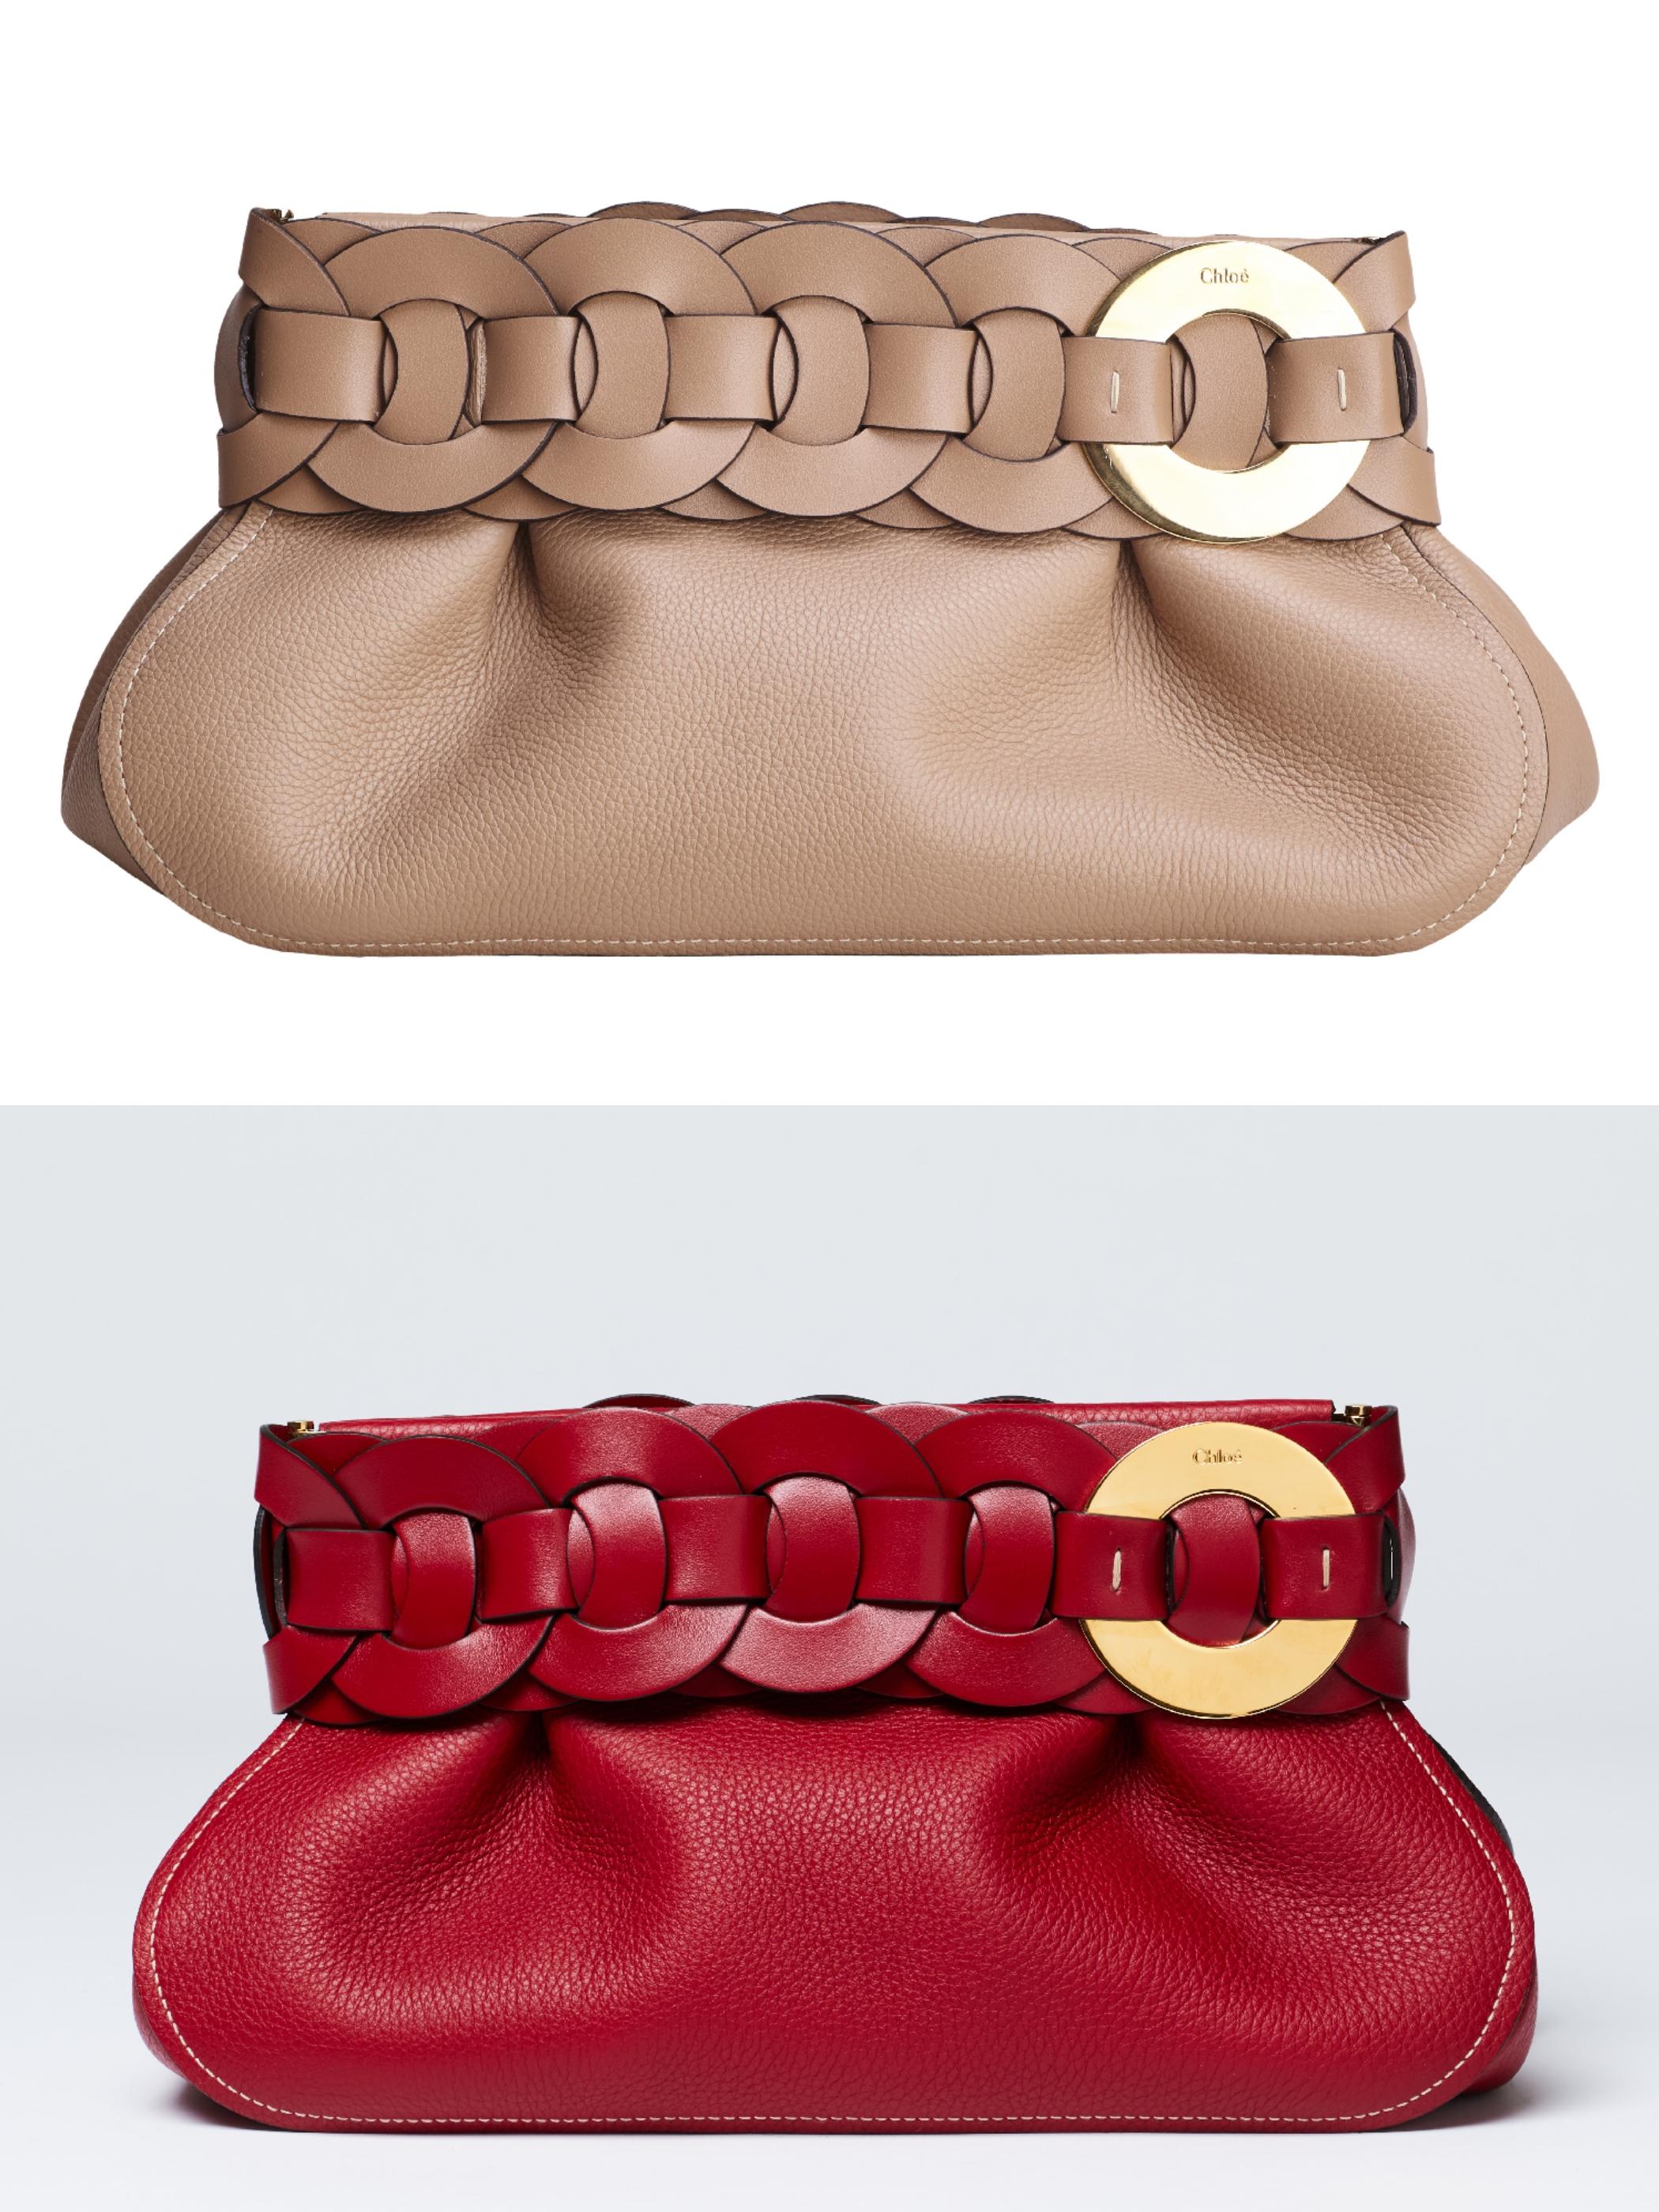 Chloé Darryl棕色手拿包,NT$47,300